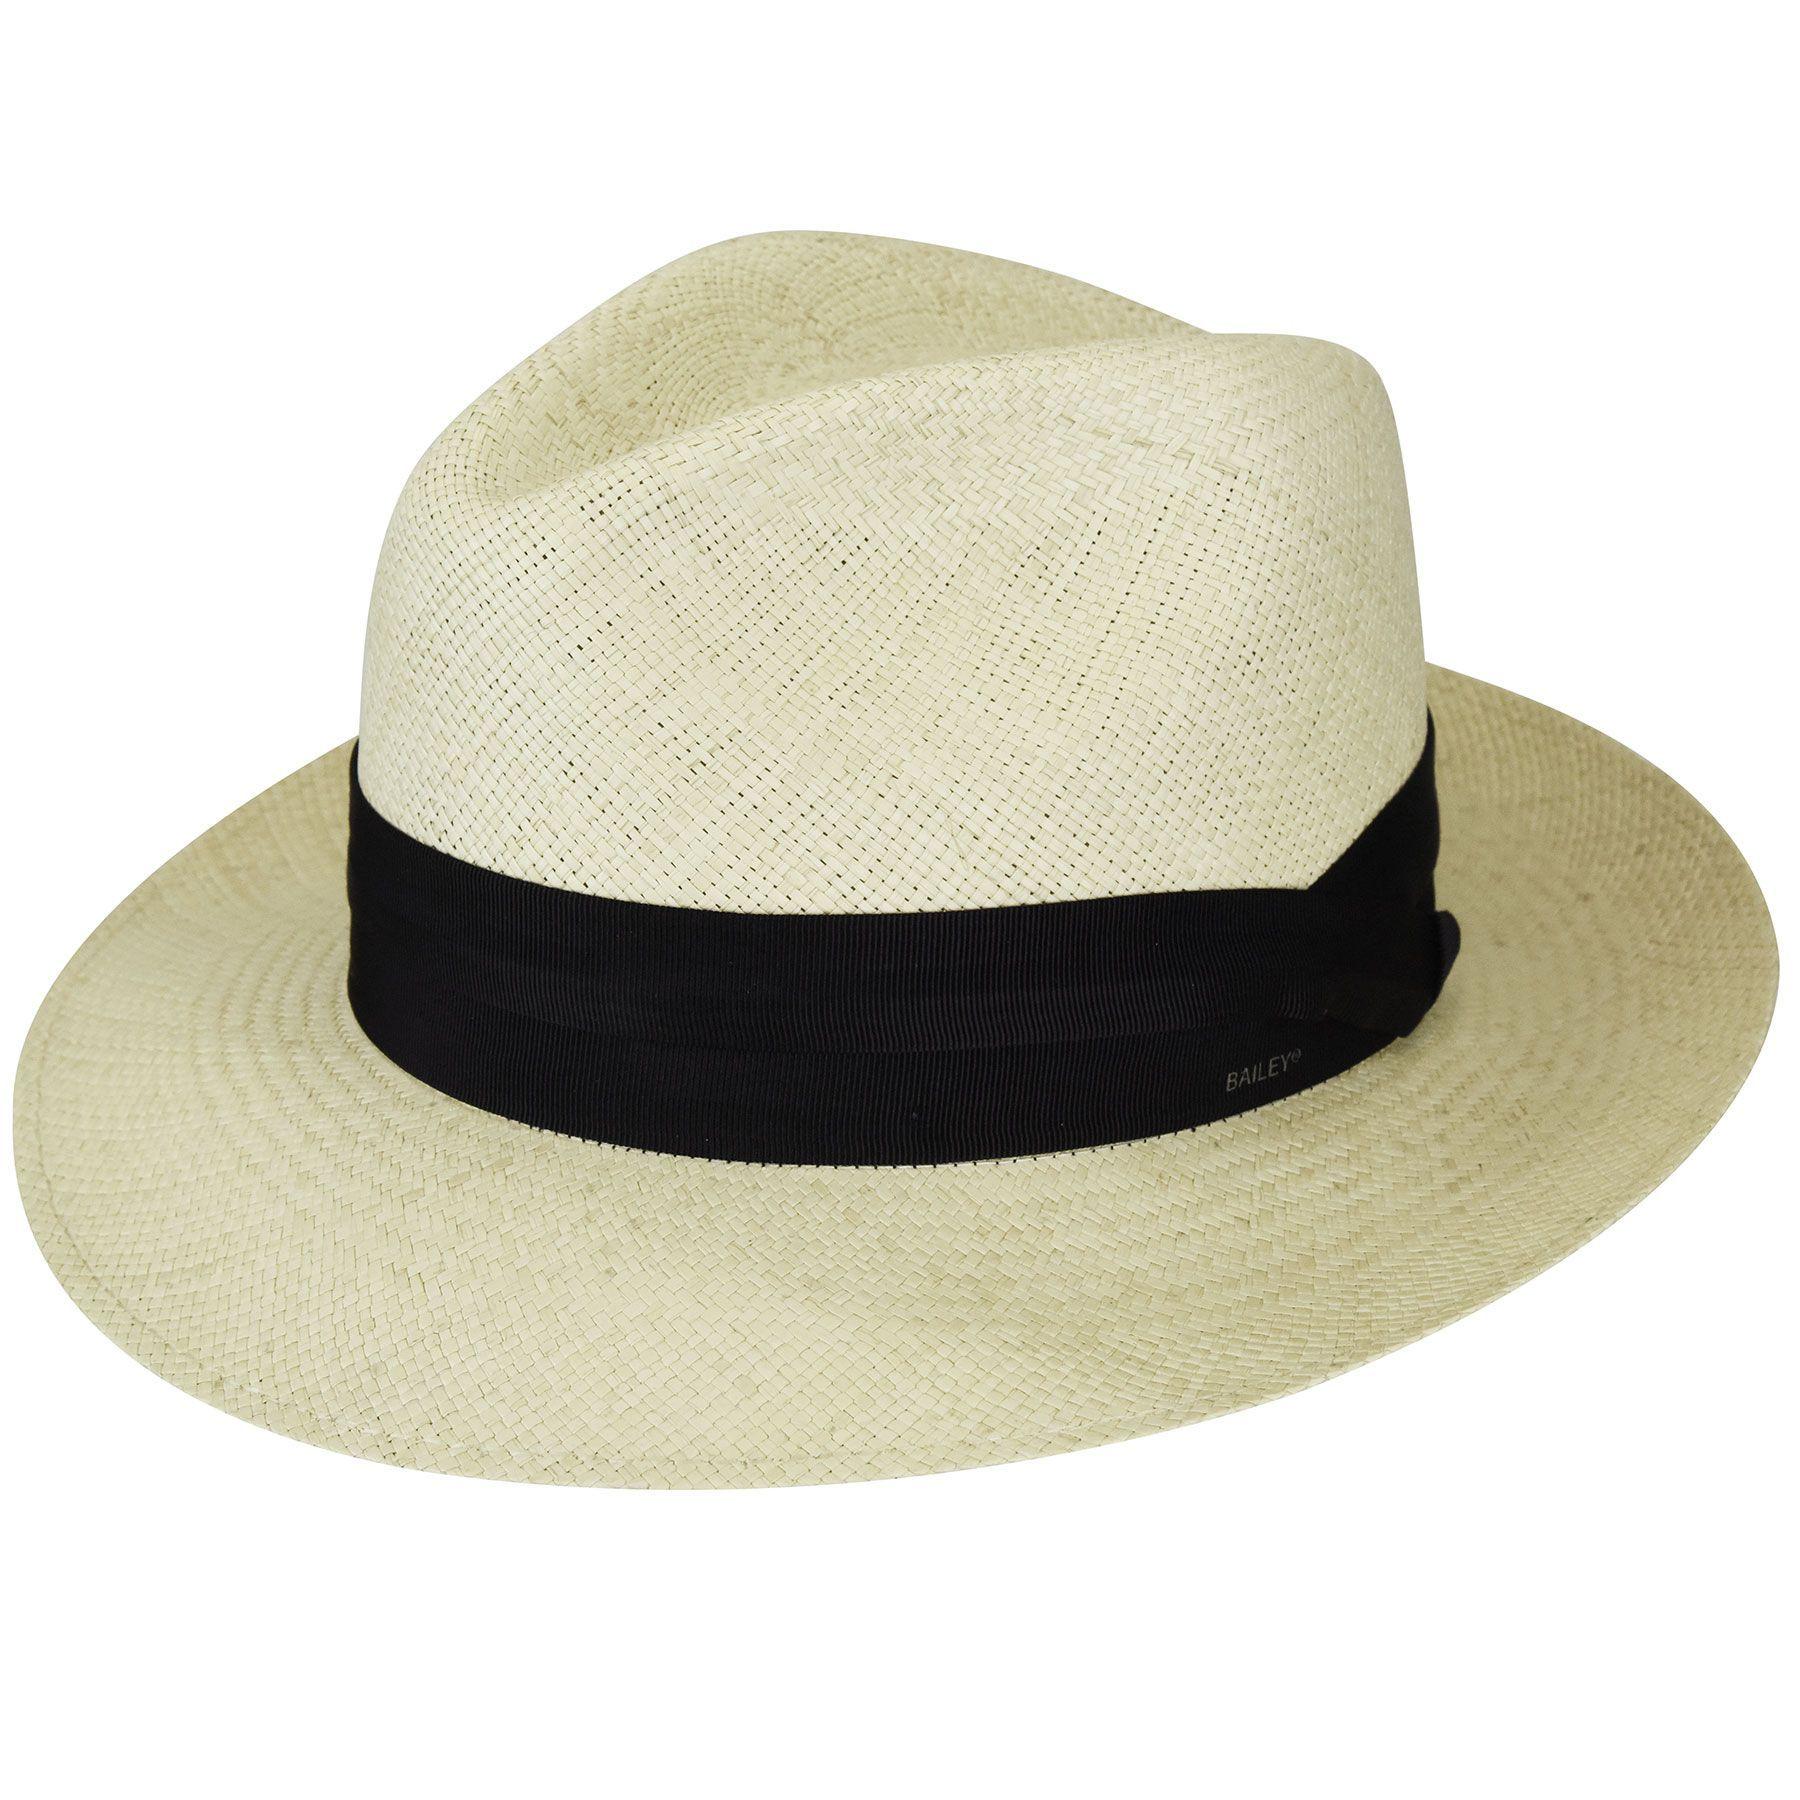 c632f444 Cuban Panama Fedora in 2019   Genuine Panama Hats   Cuban hat, Hats, Panama